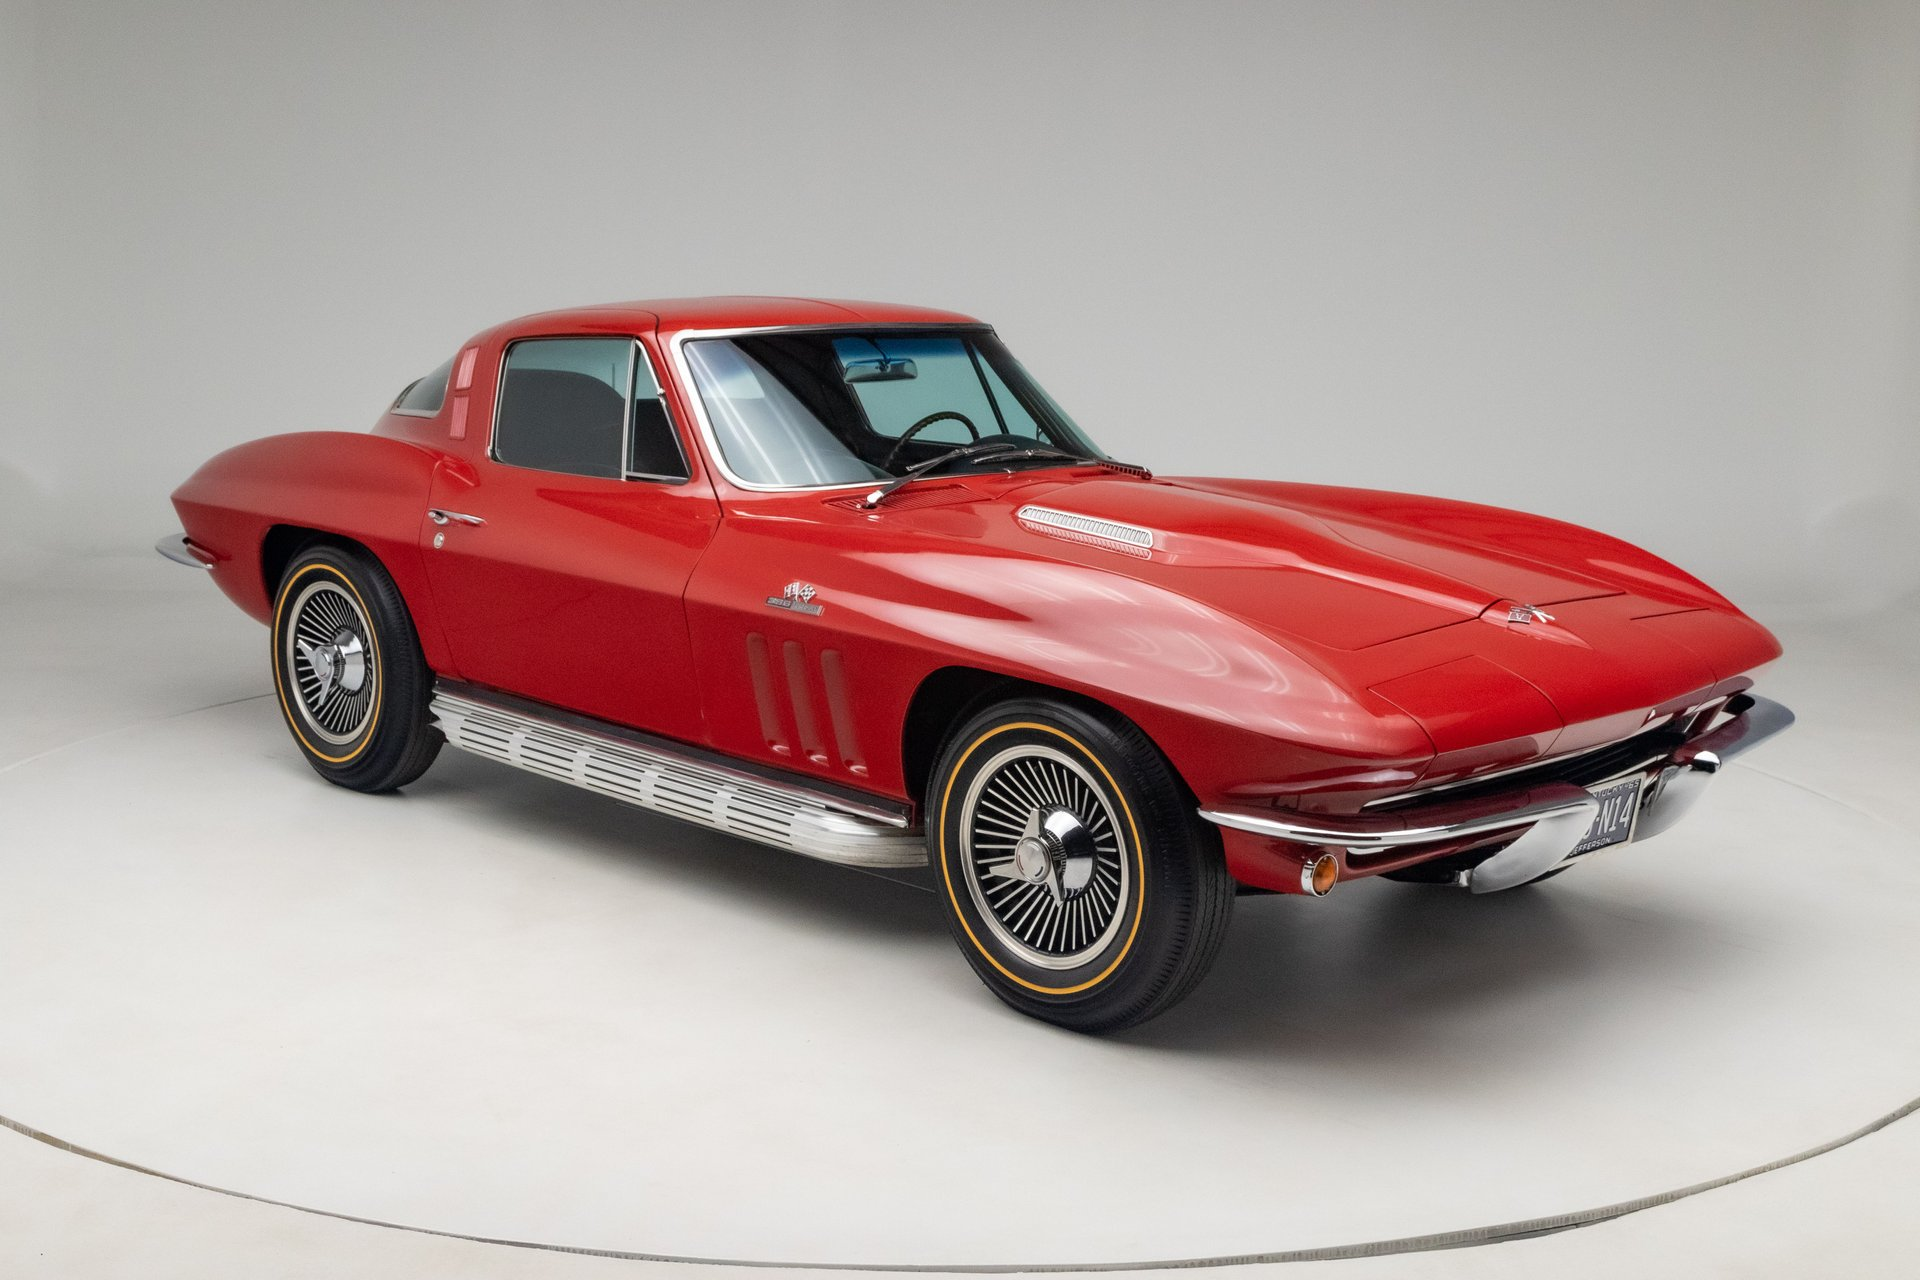 1965 chevrolet corvette coupe 396 425 hp